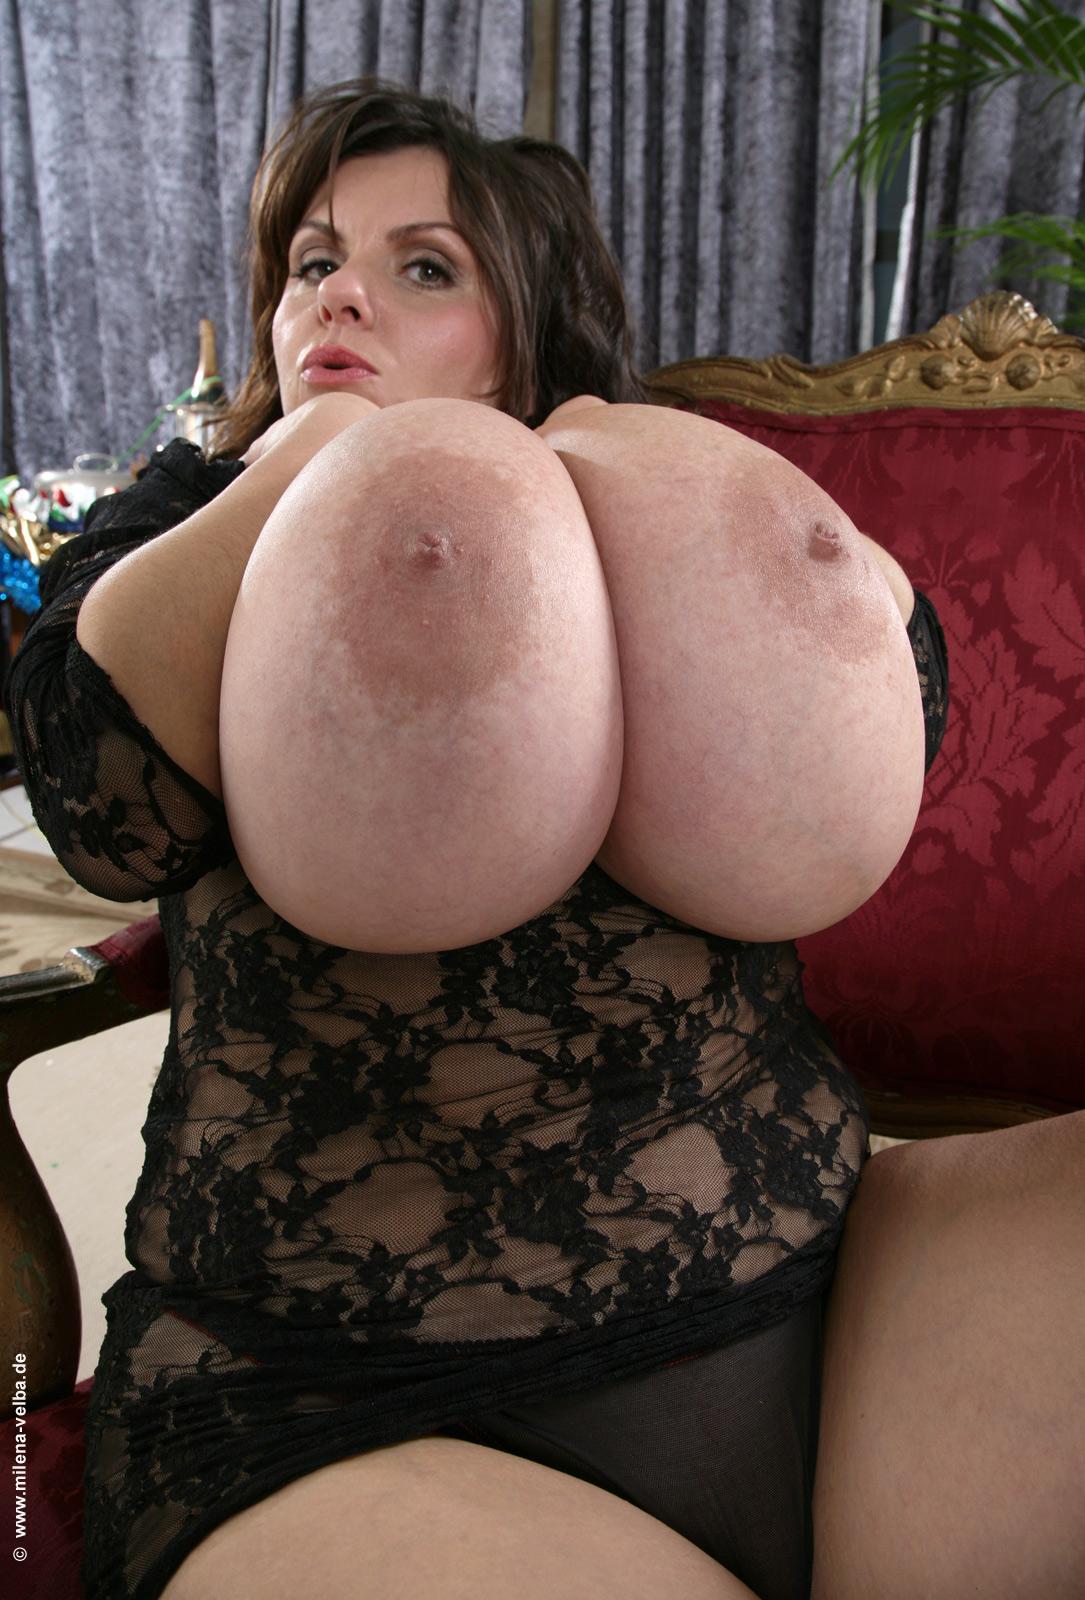 Big breasted singles